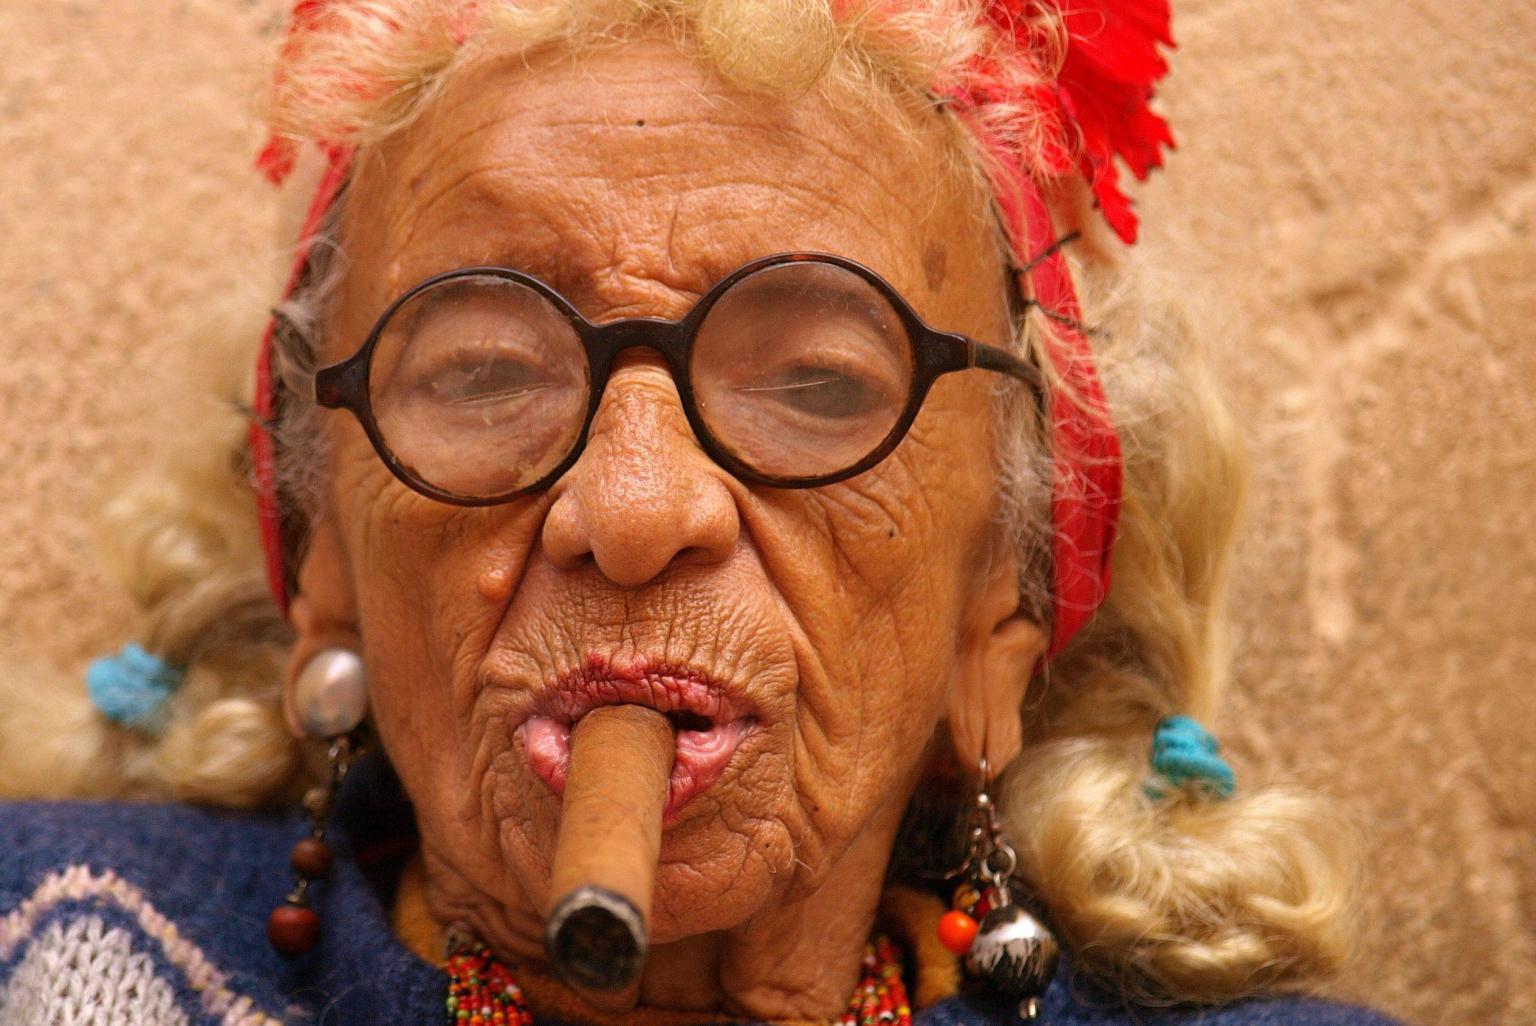 smokin' graciela, havana's famous cigar lady, is truly badass | huffpost